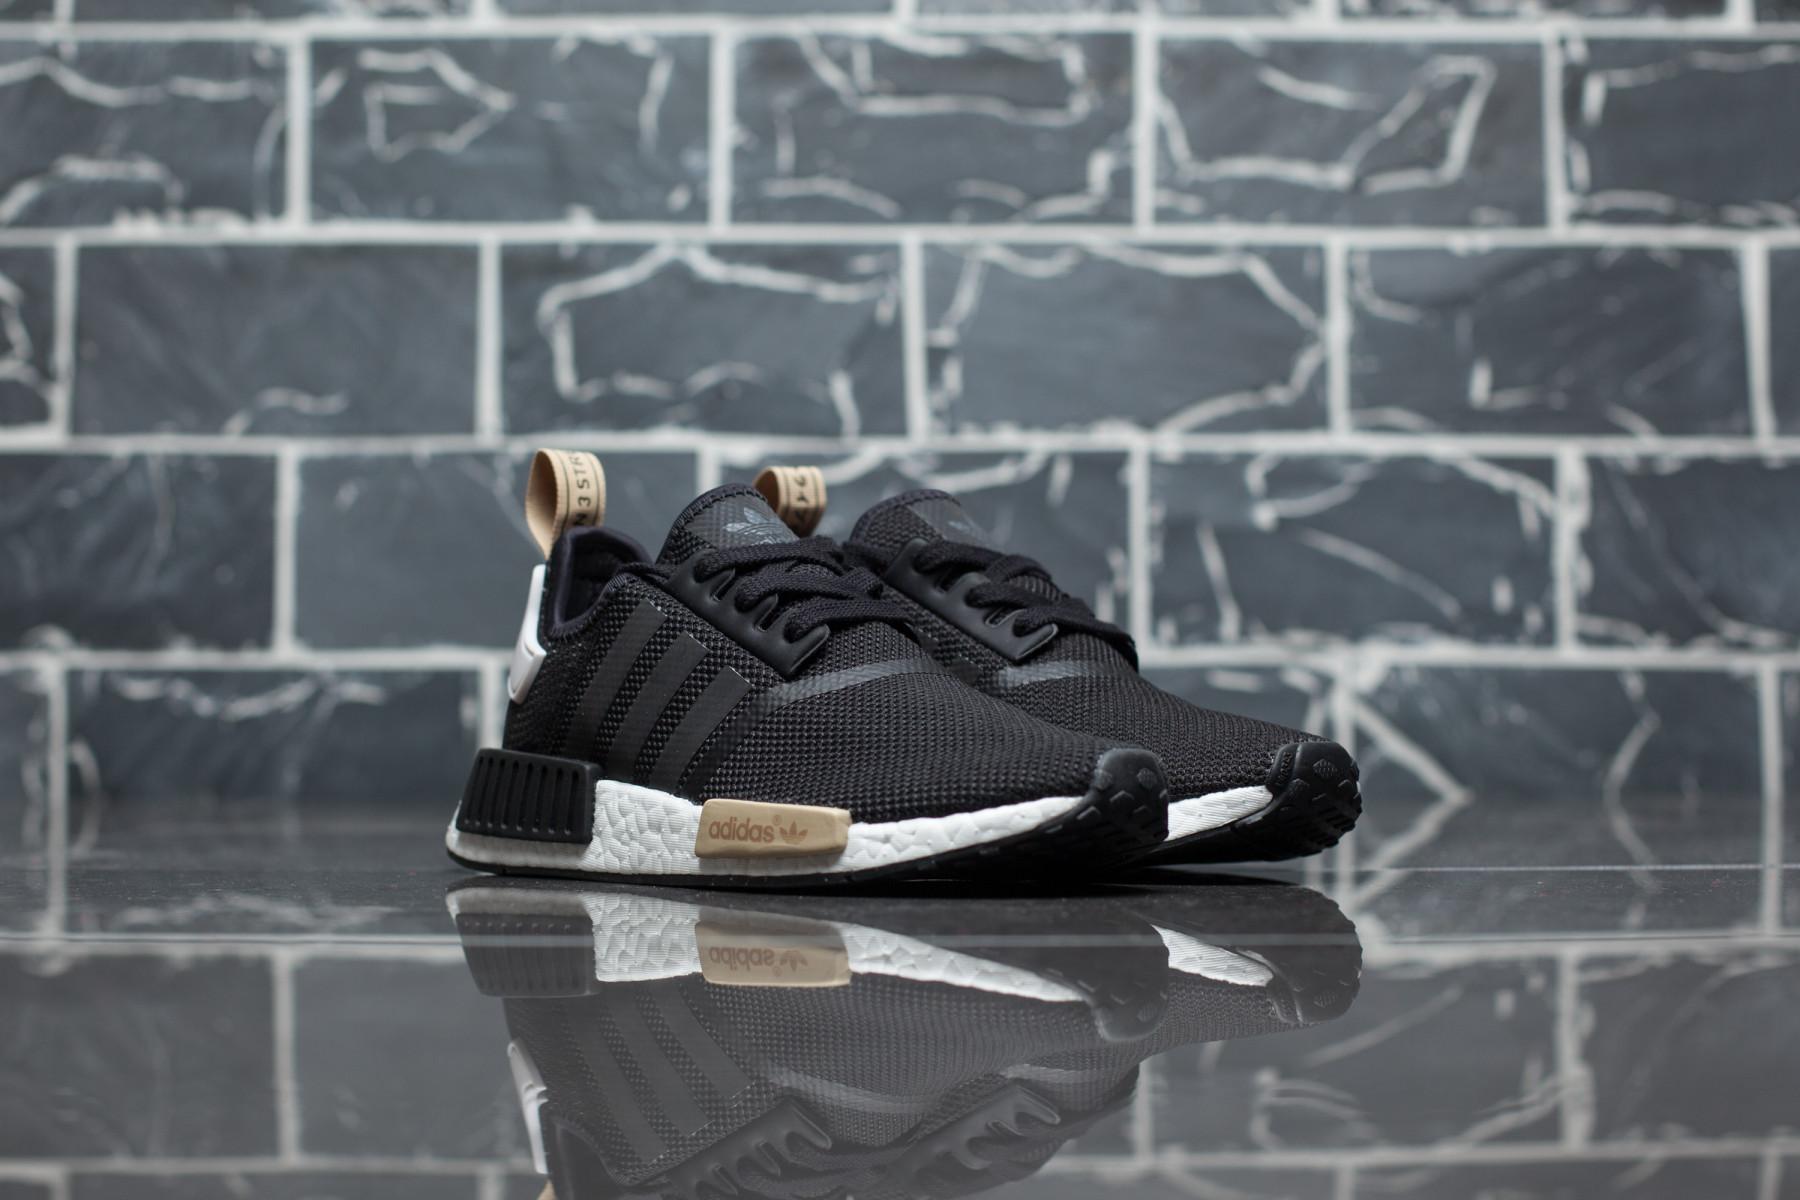 New Style Nike Air More Uptempo 'Reflective' BlackBlack